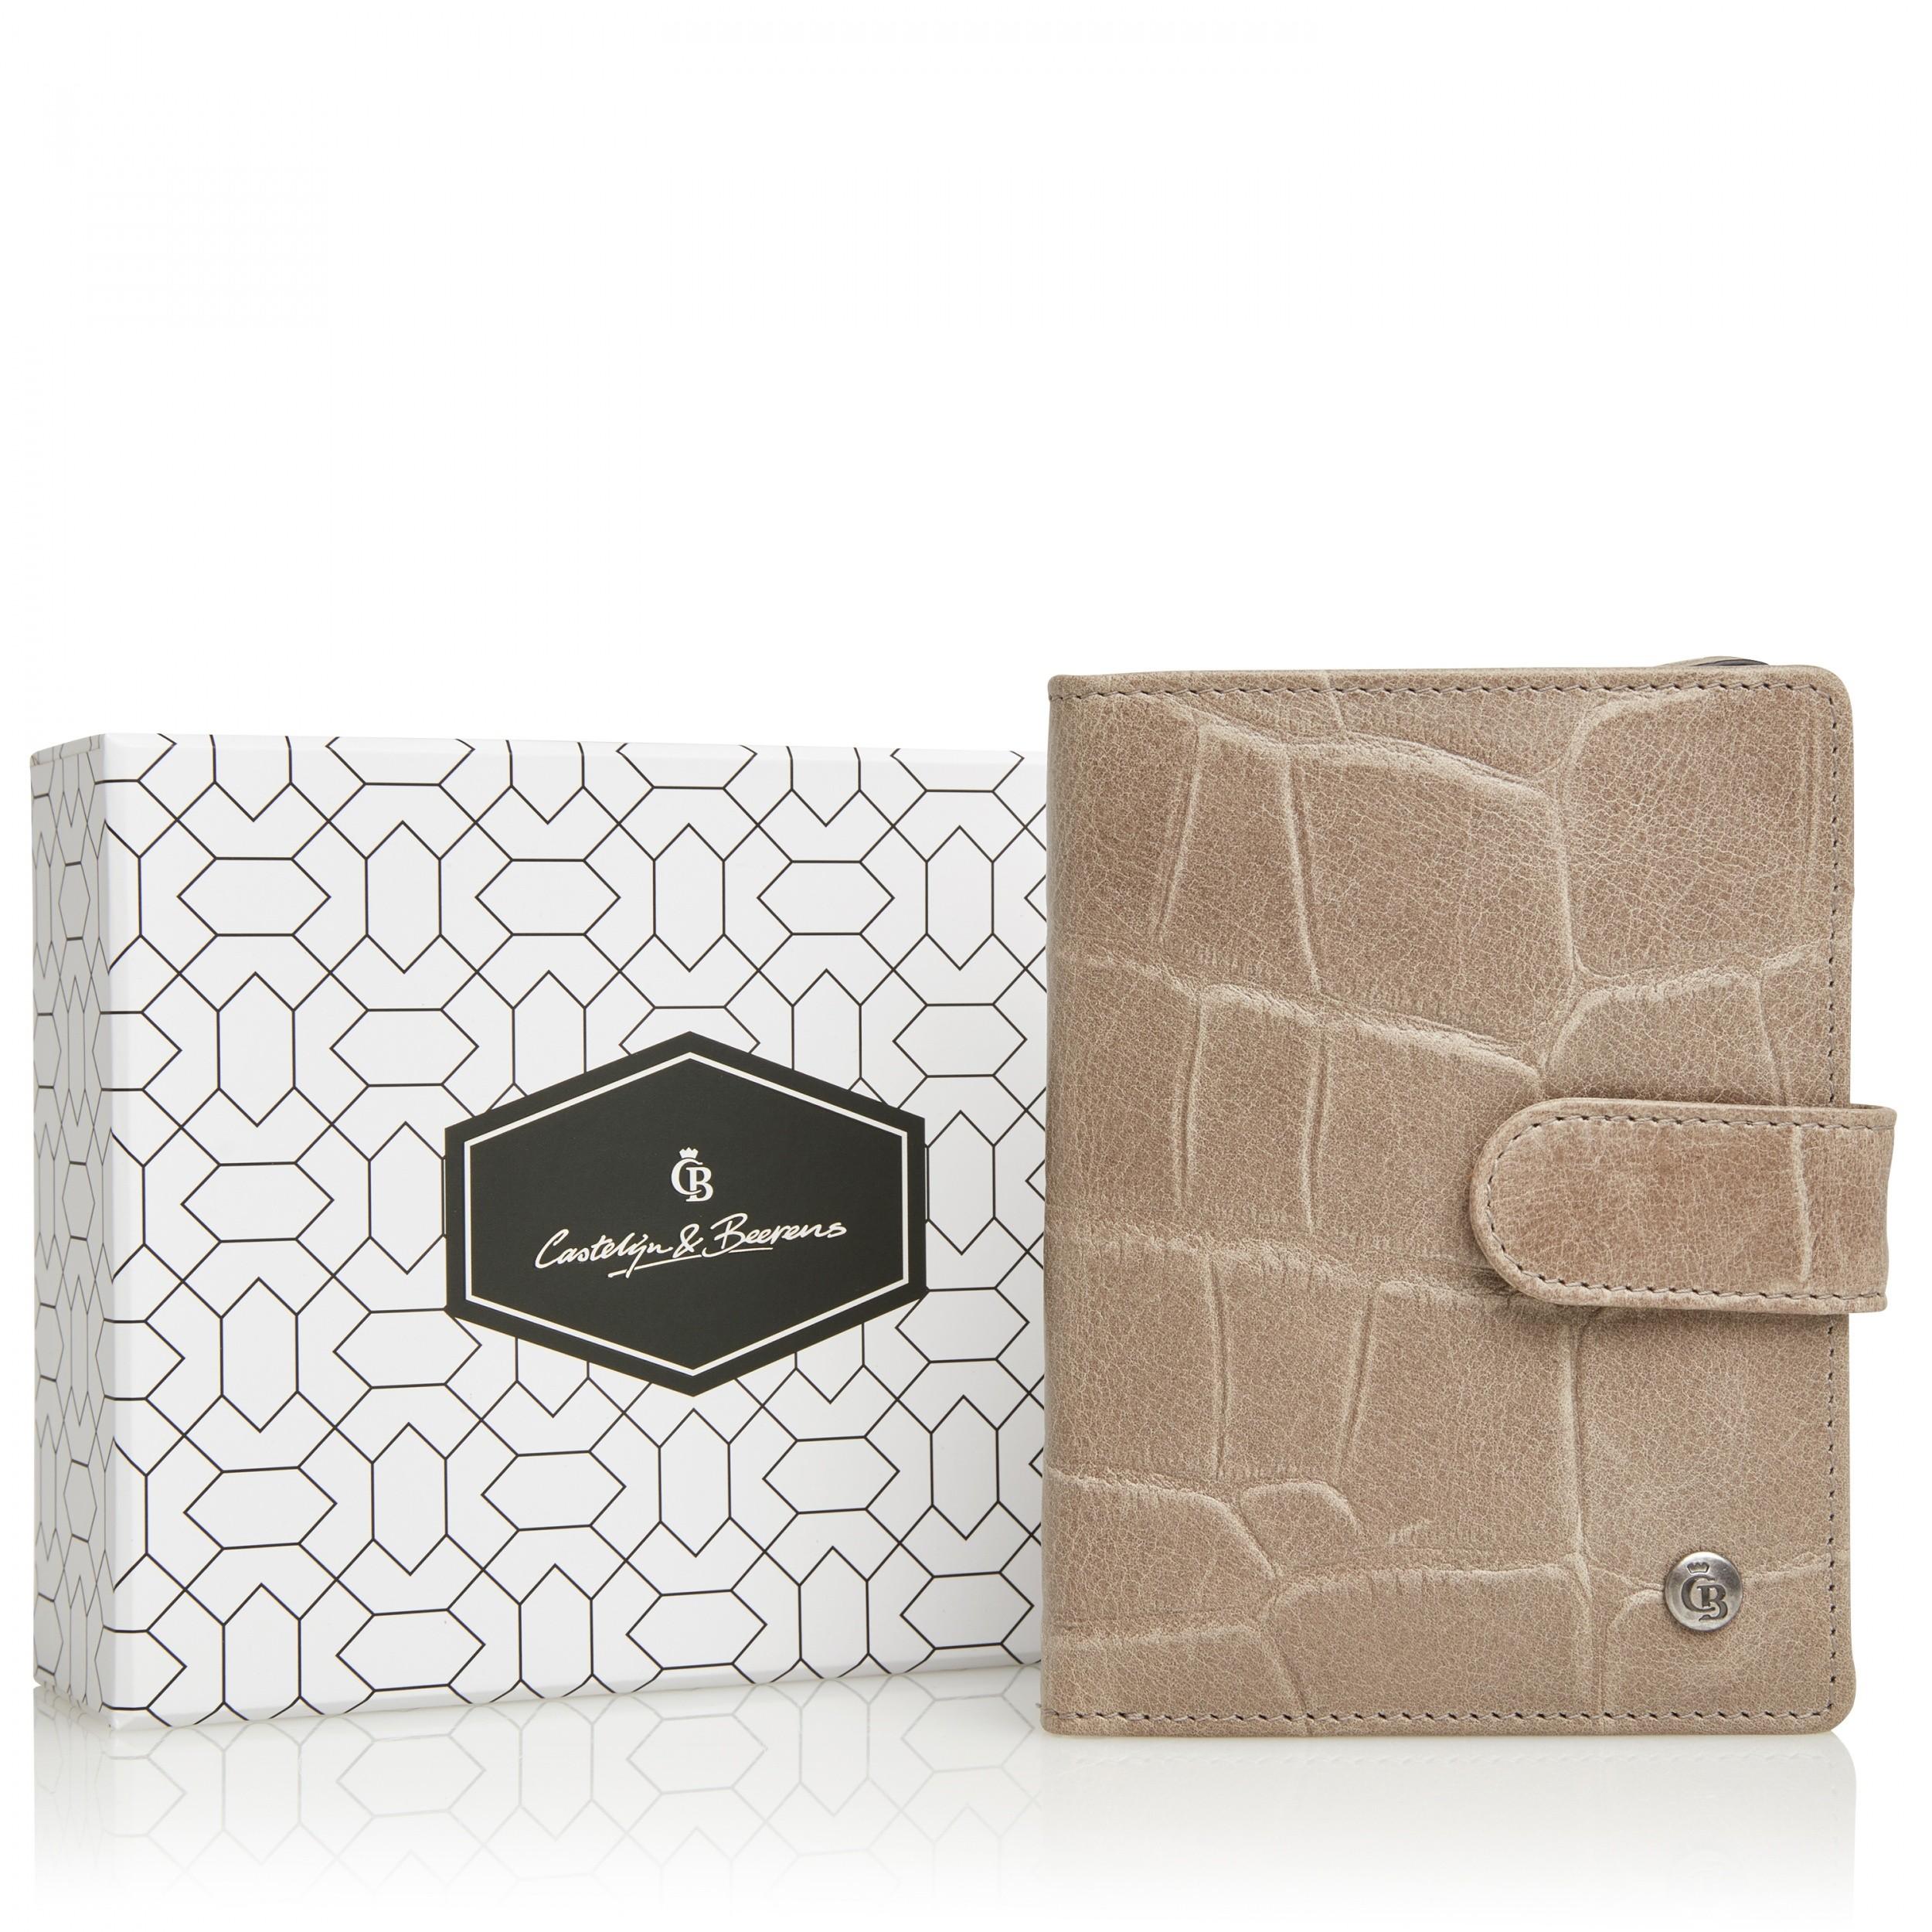 Castelijn & Beerens 80 5415 Giftbox Ritsportemonnee RFID Taupe